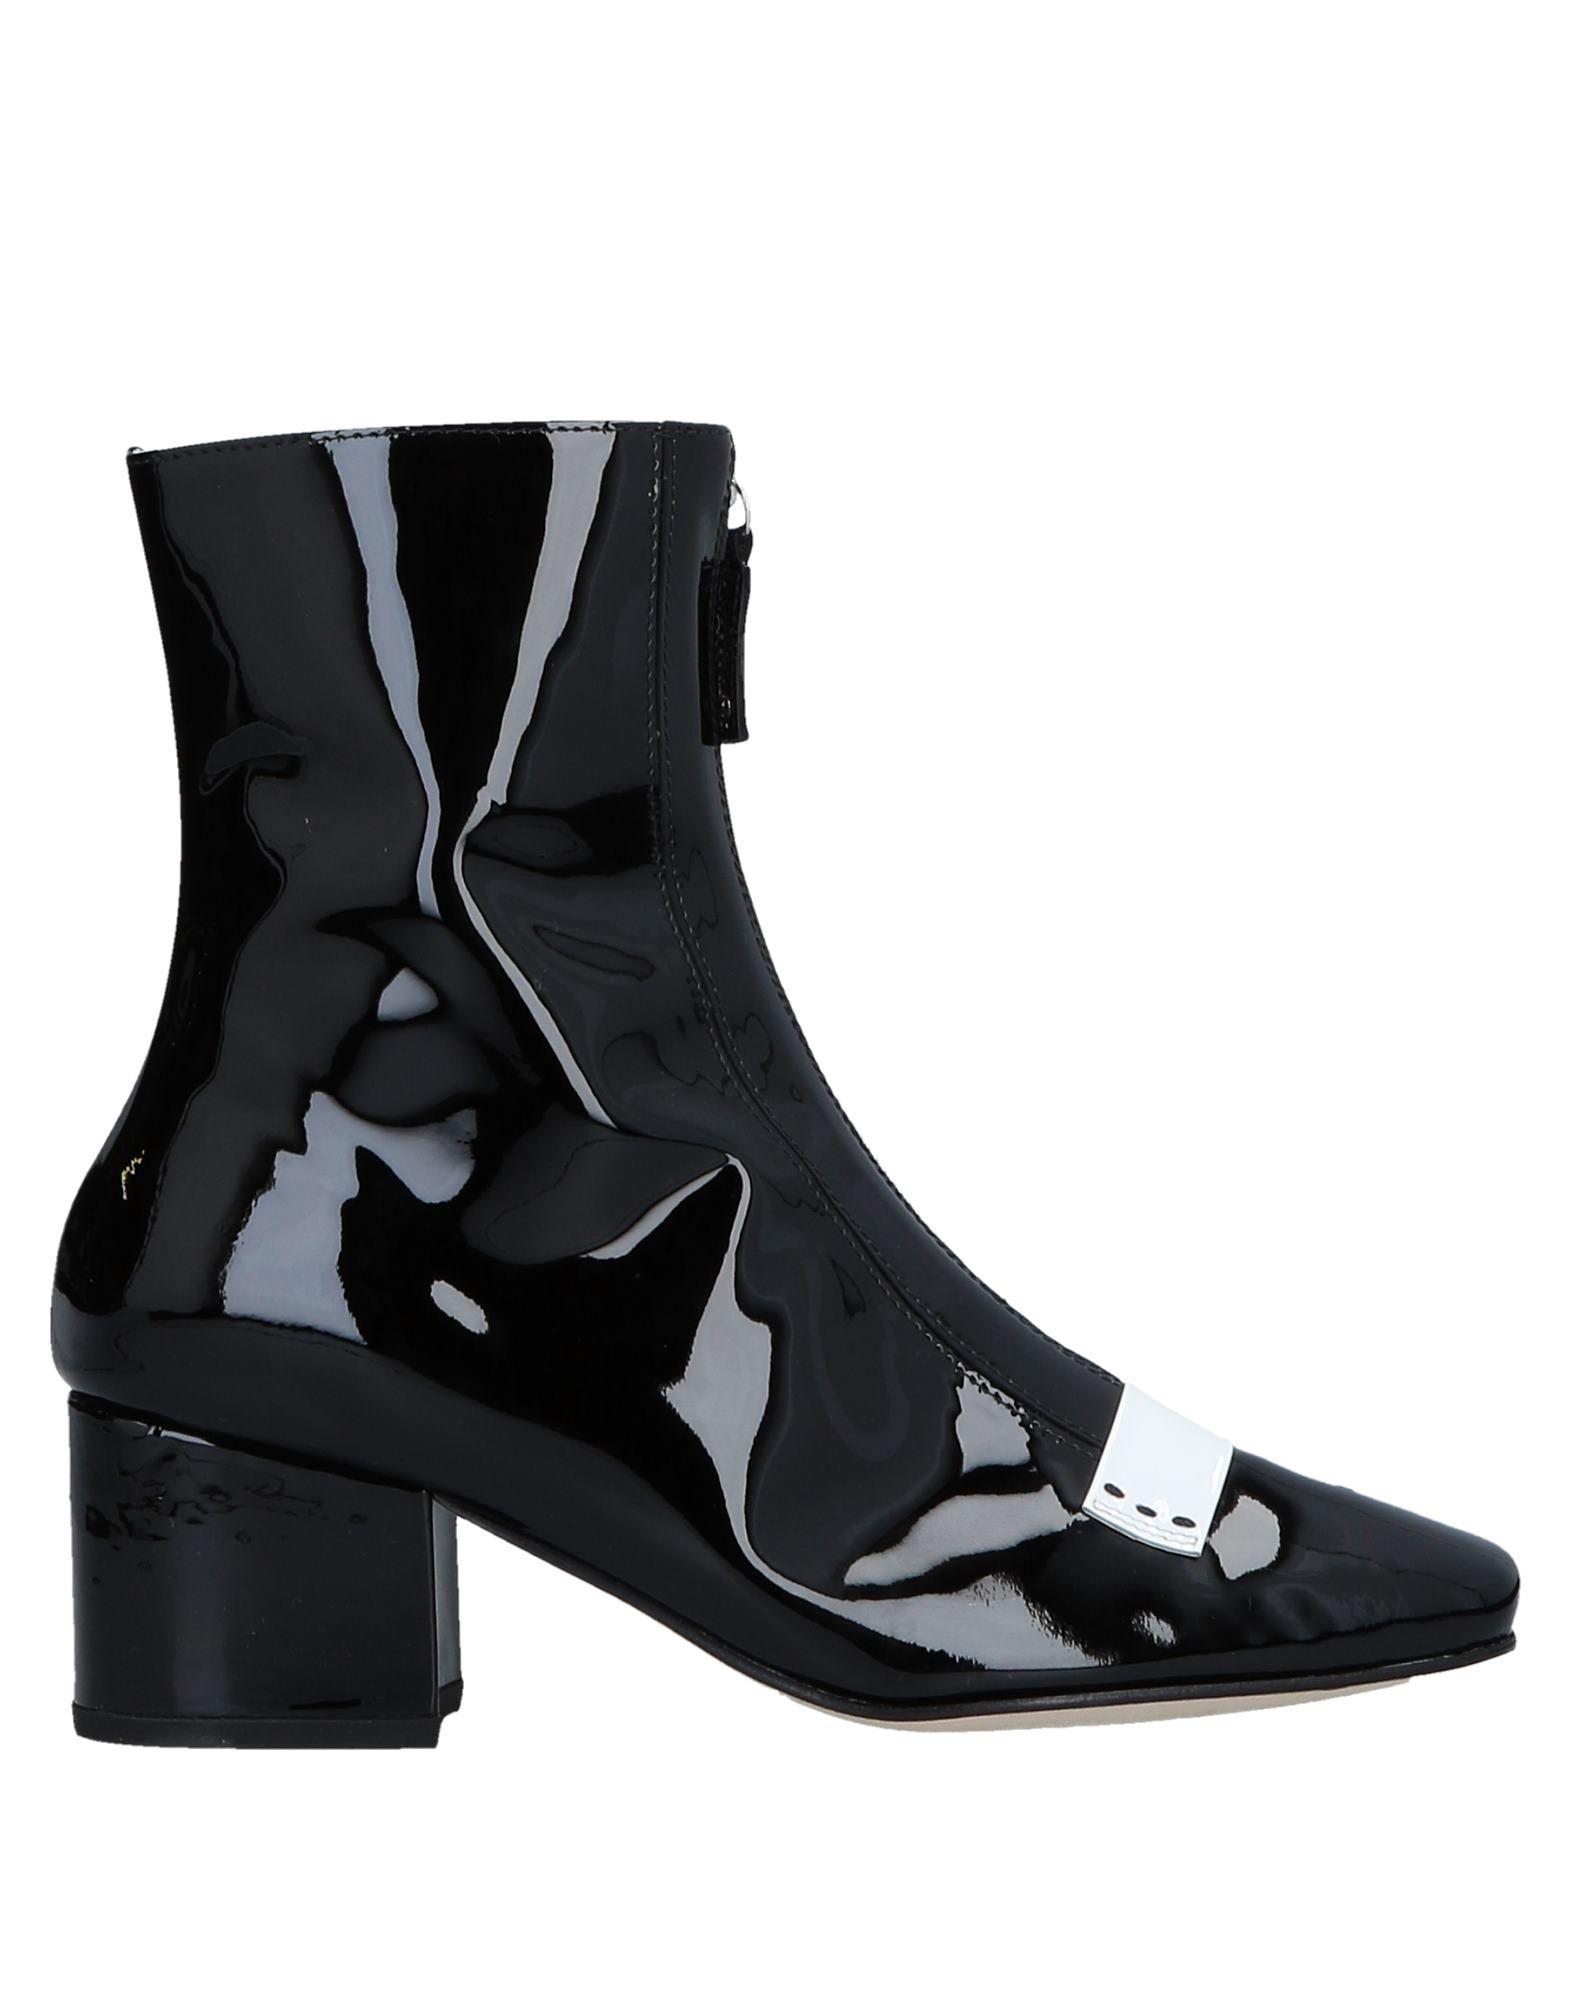 Dorateymur Ankle Boot - Women Dorateymur  Ankle Boots online on  Dorateymur Australia - 11530785MH 7e8a70